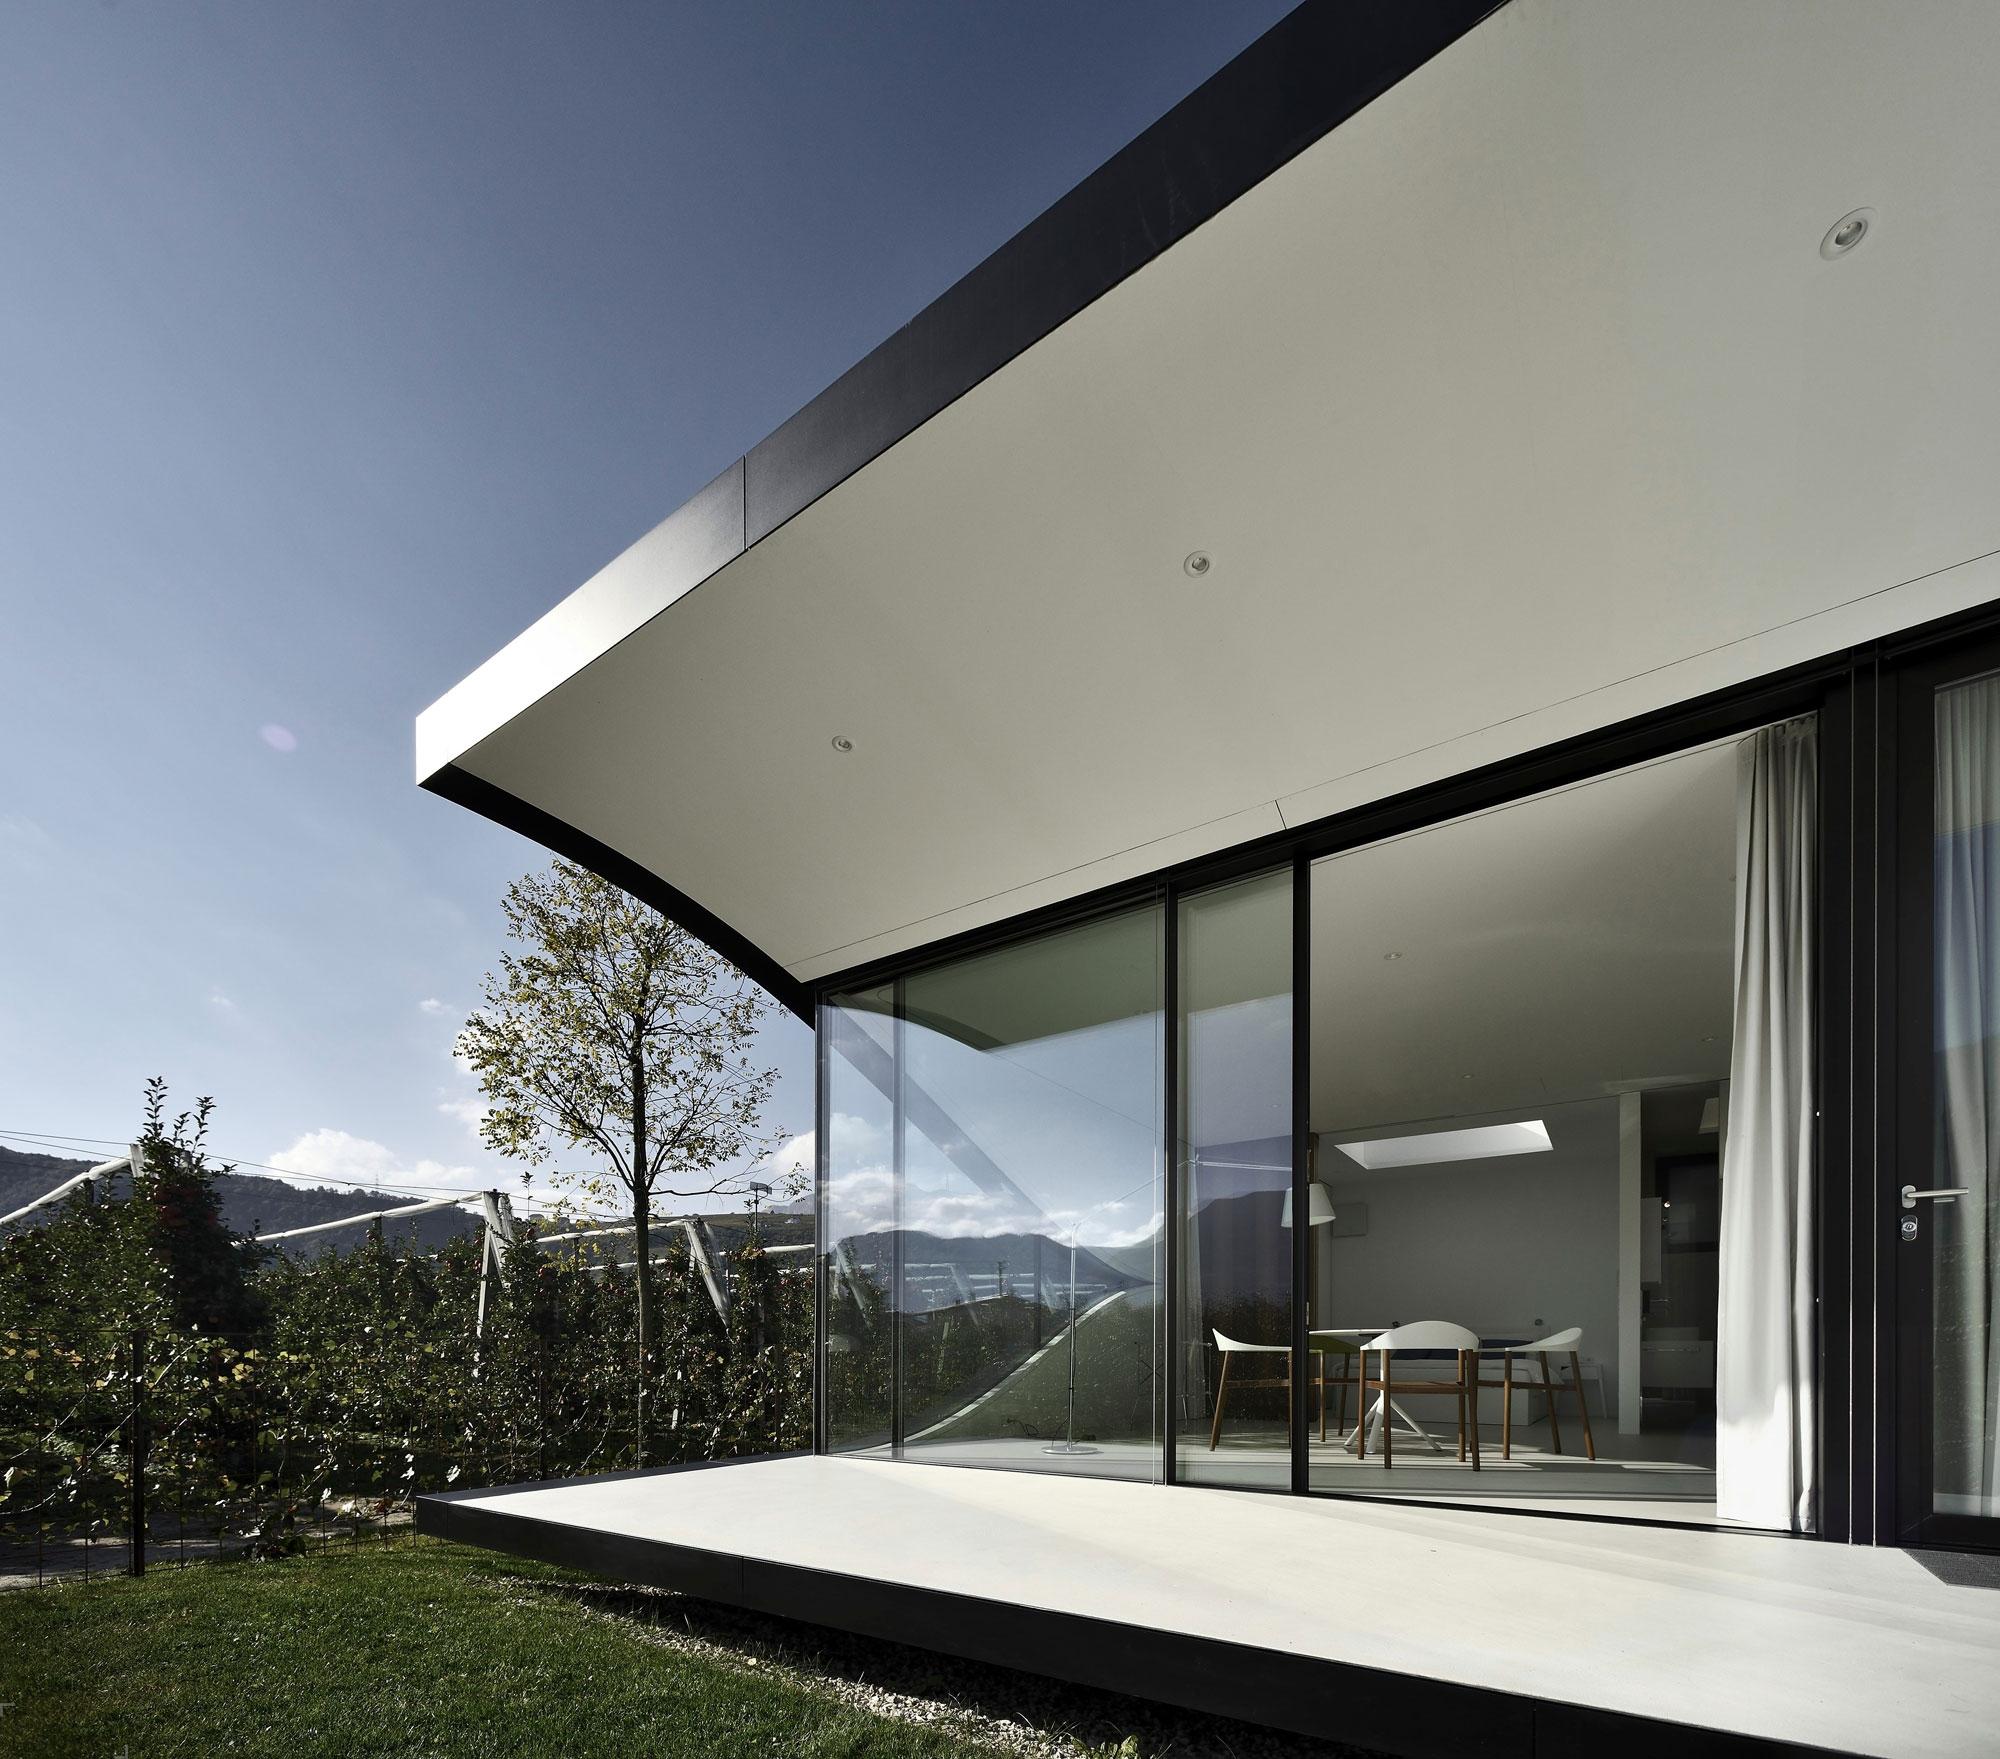 Черно-белый фасад дома в стиле модерн